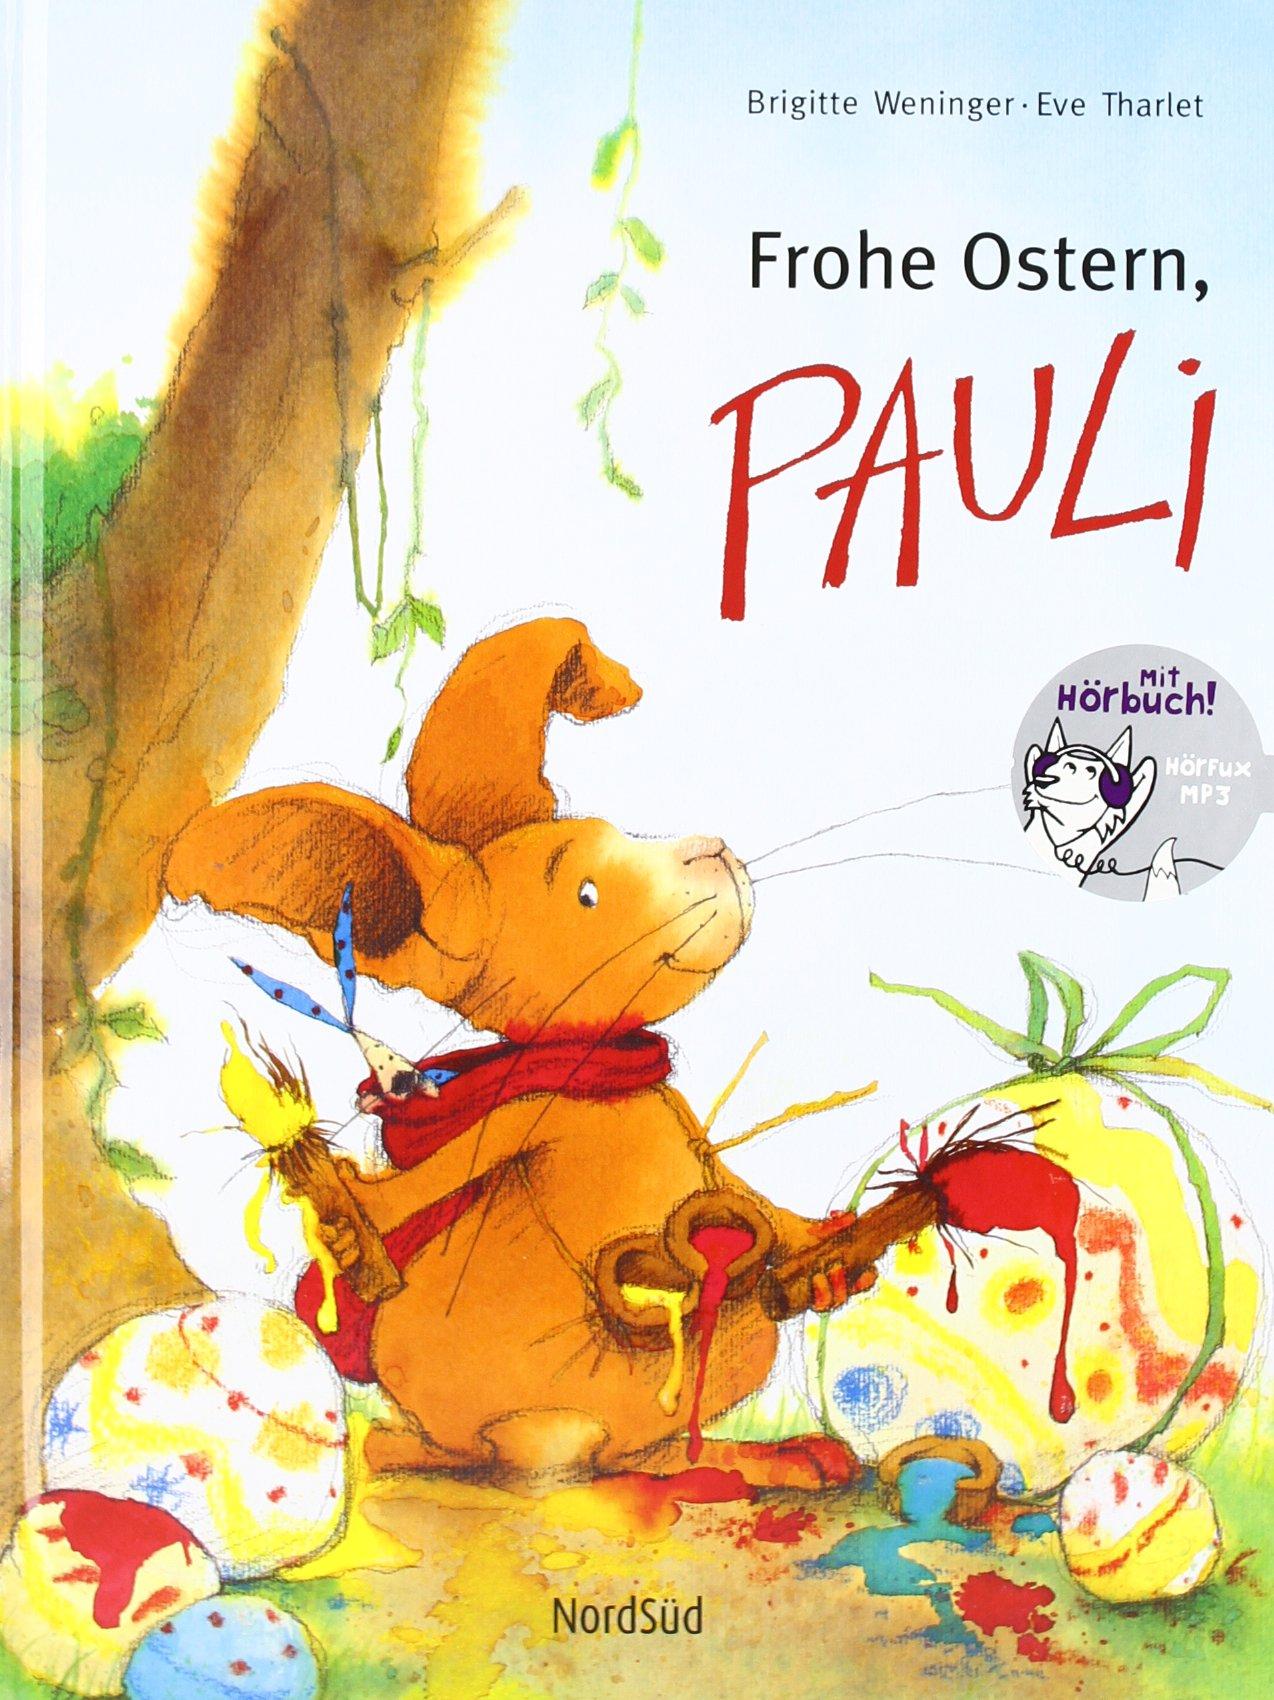 Frohe Ostern, Pauli: Amazon.de: Brigitte Weninger, Eve Tharlet: Bücher